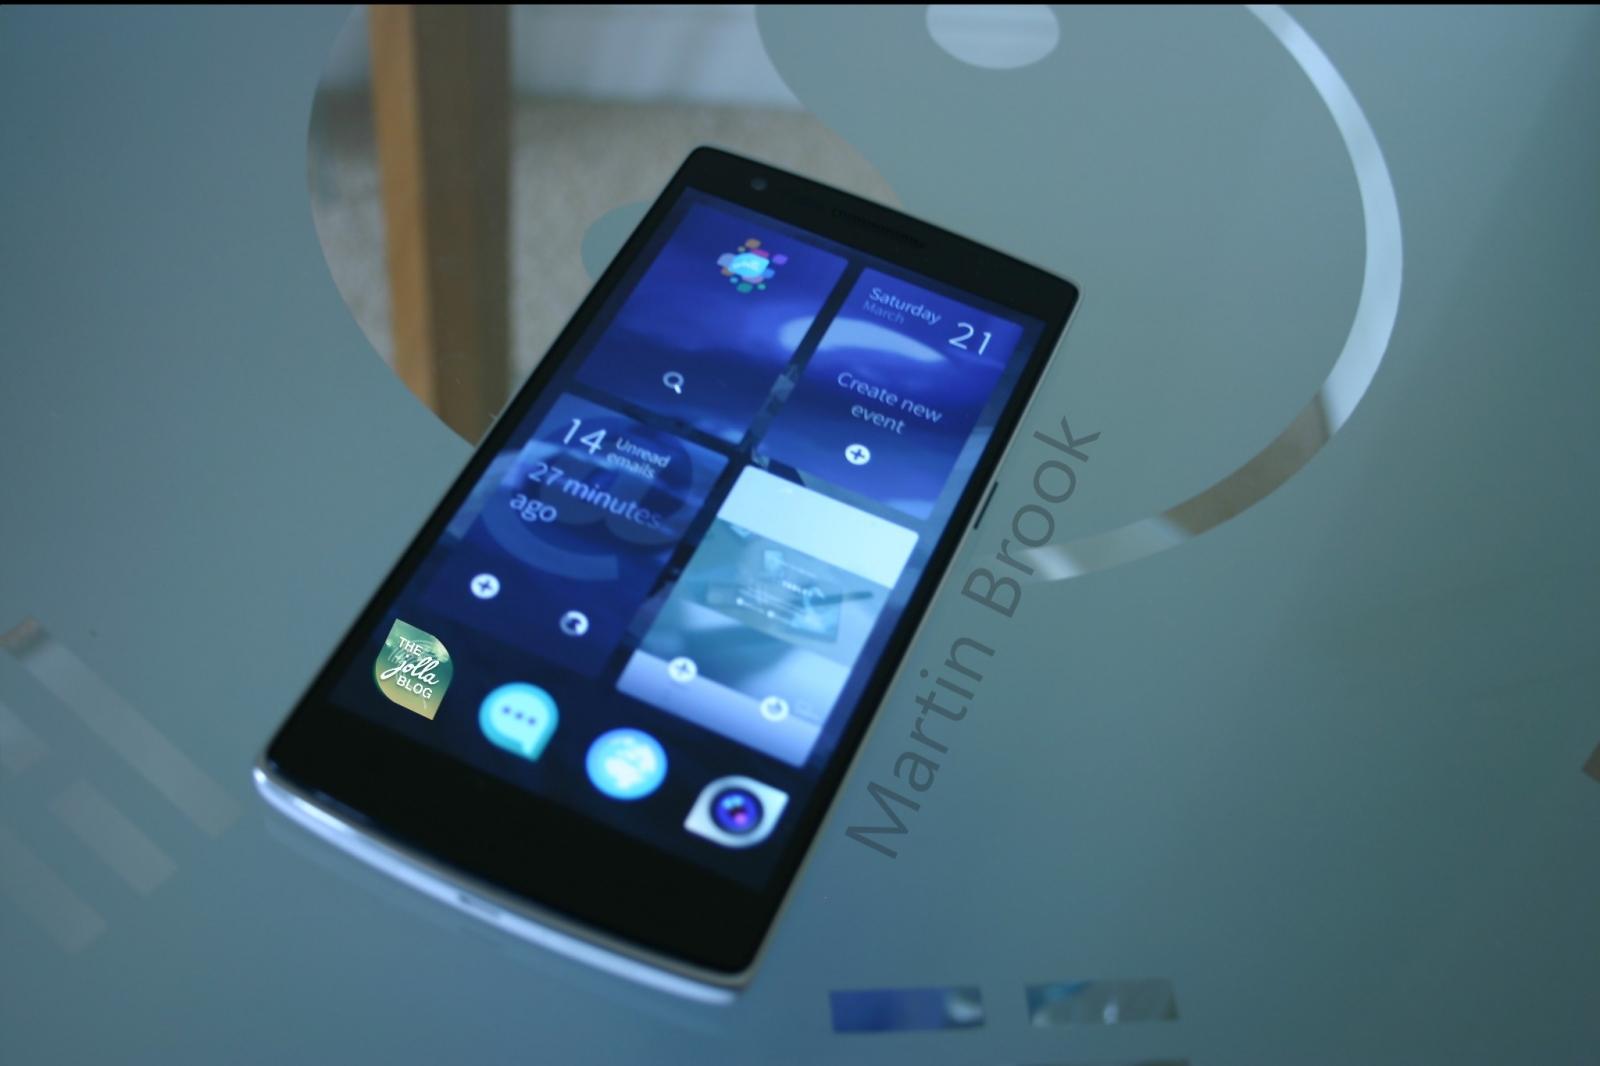 OnePlus One gets Sailfish OS